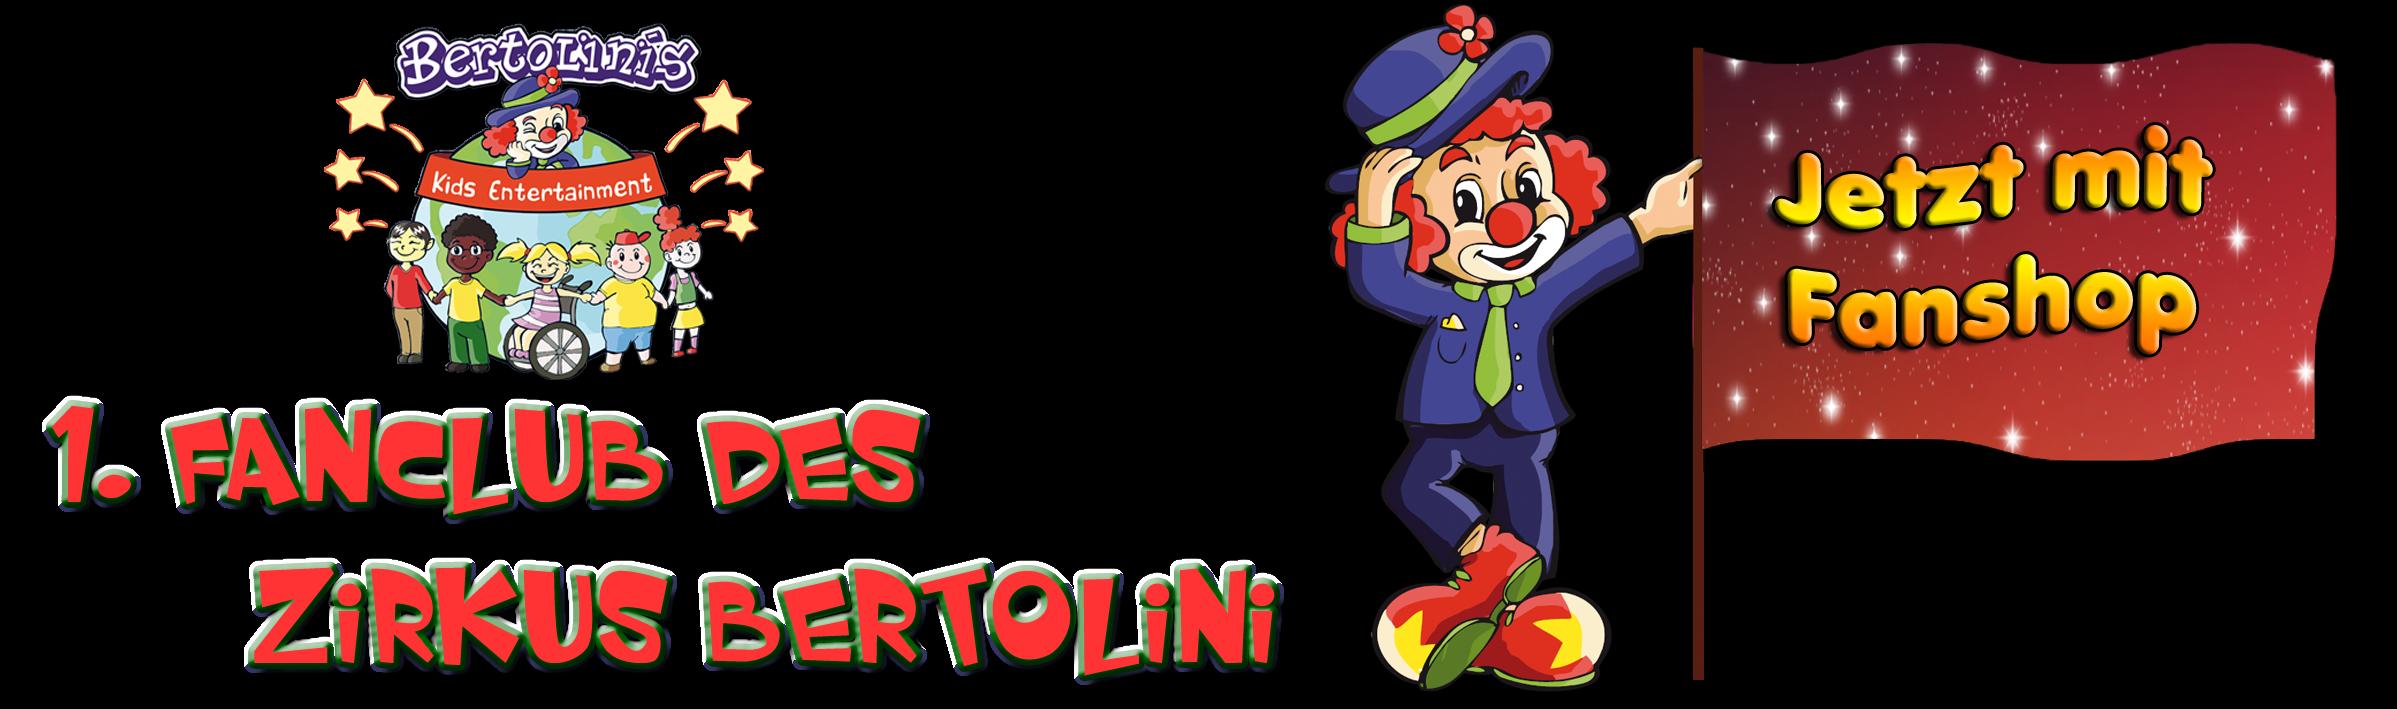 1. Fanclub des Projektzirkus Bertolini